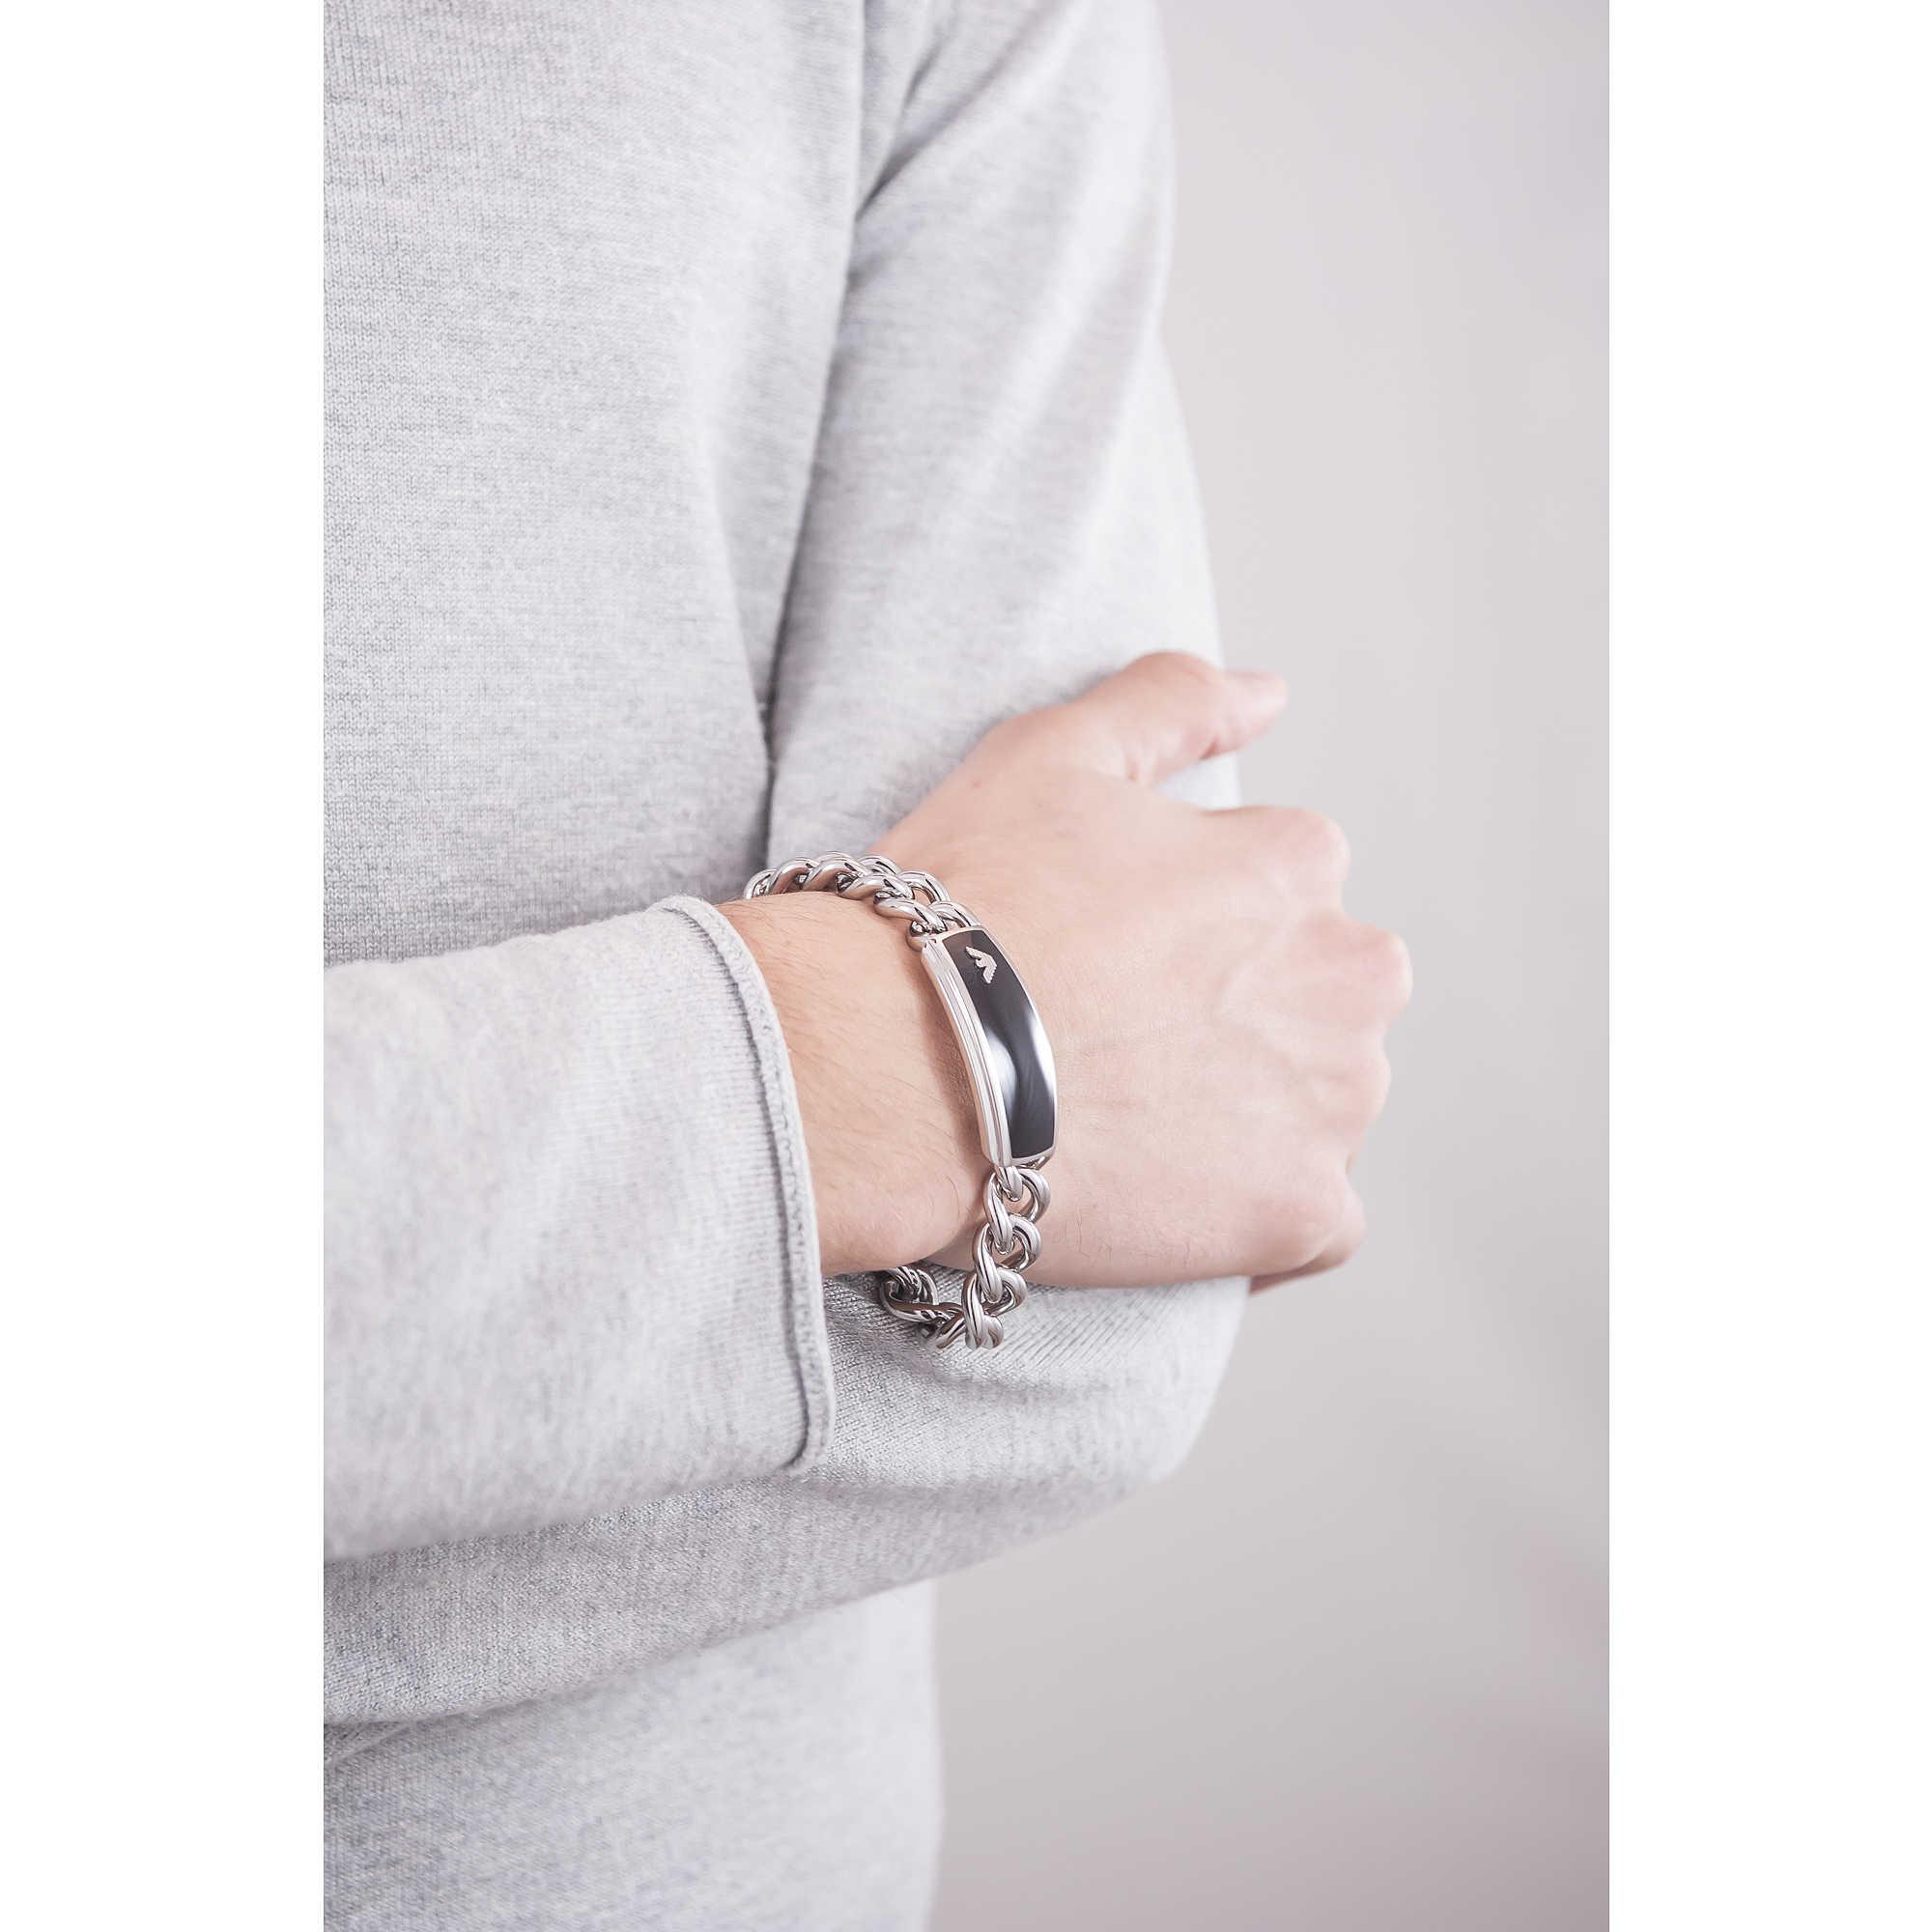 zoom · package bracelets Emporio Armani EGS172904019. zoom · bracelet man  jewellery Emporio Armani EGS172904019 31114148a63